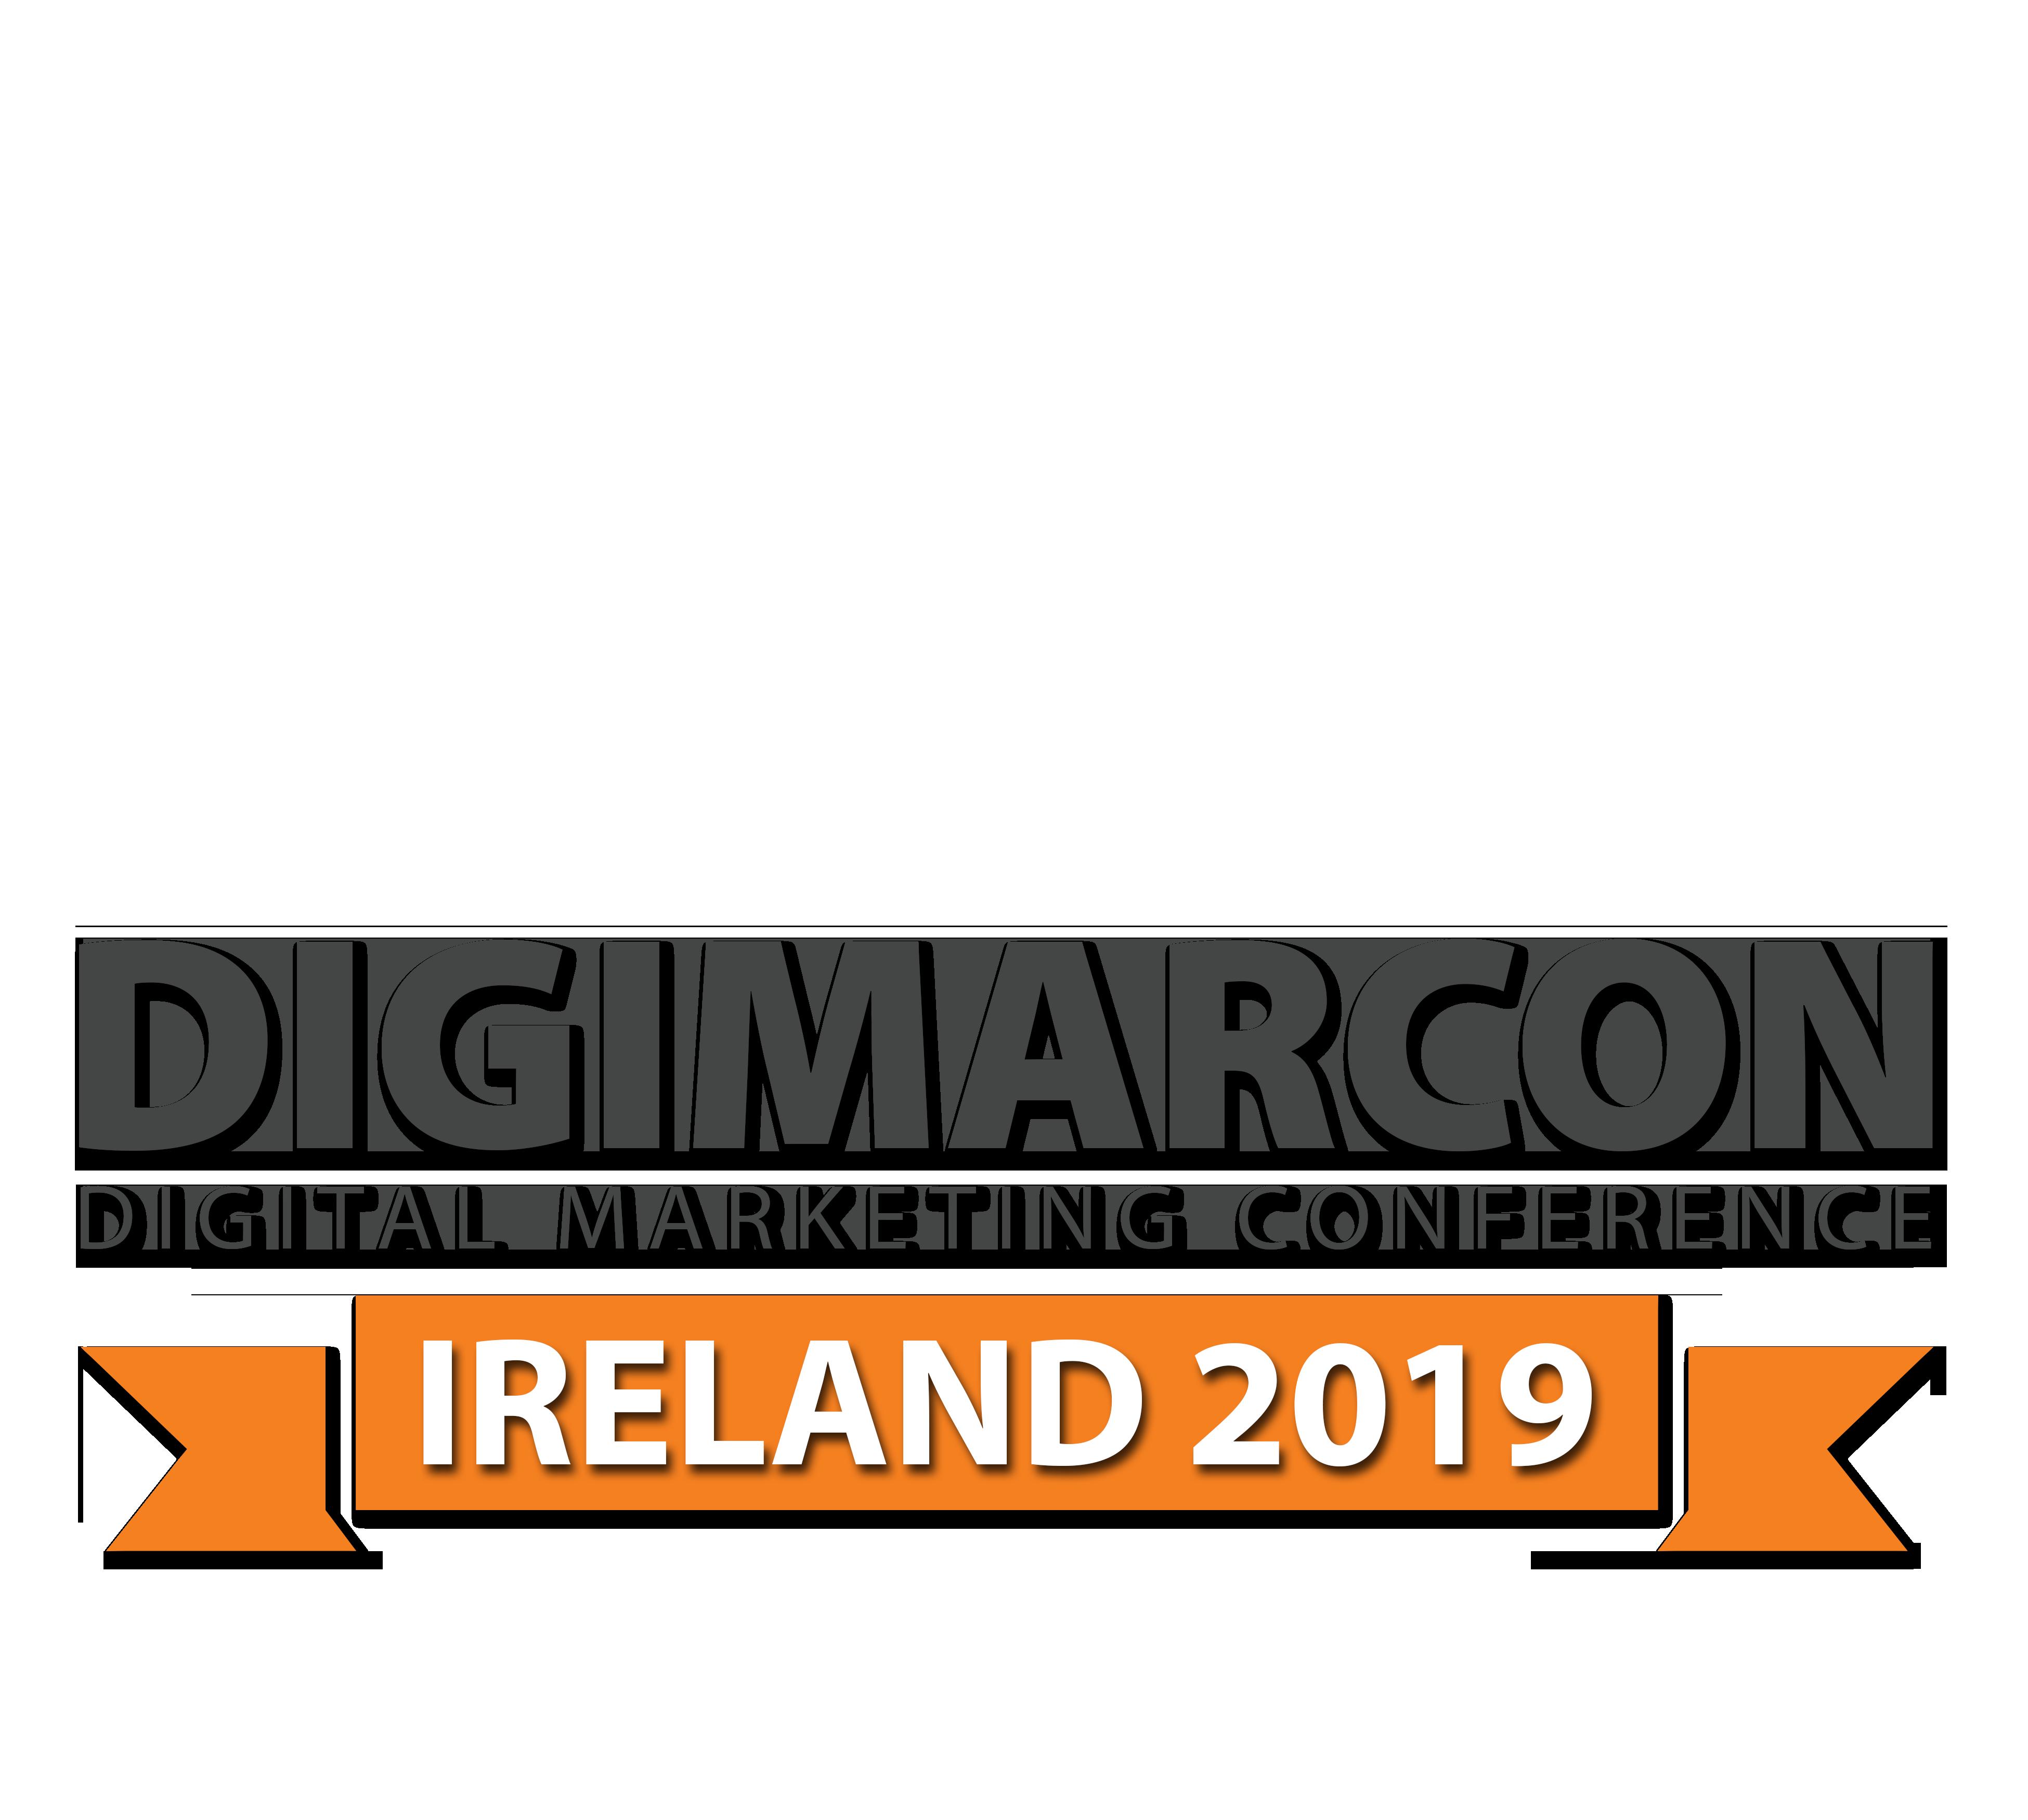 FAQ's: DigiMarCon Ireland 2019 · September 4 - 5, 2019